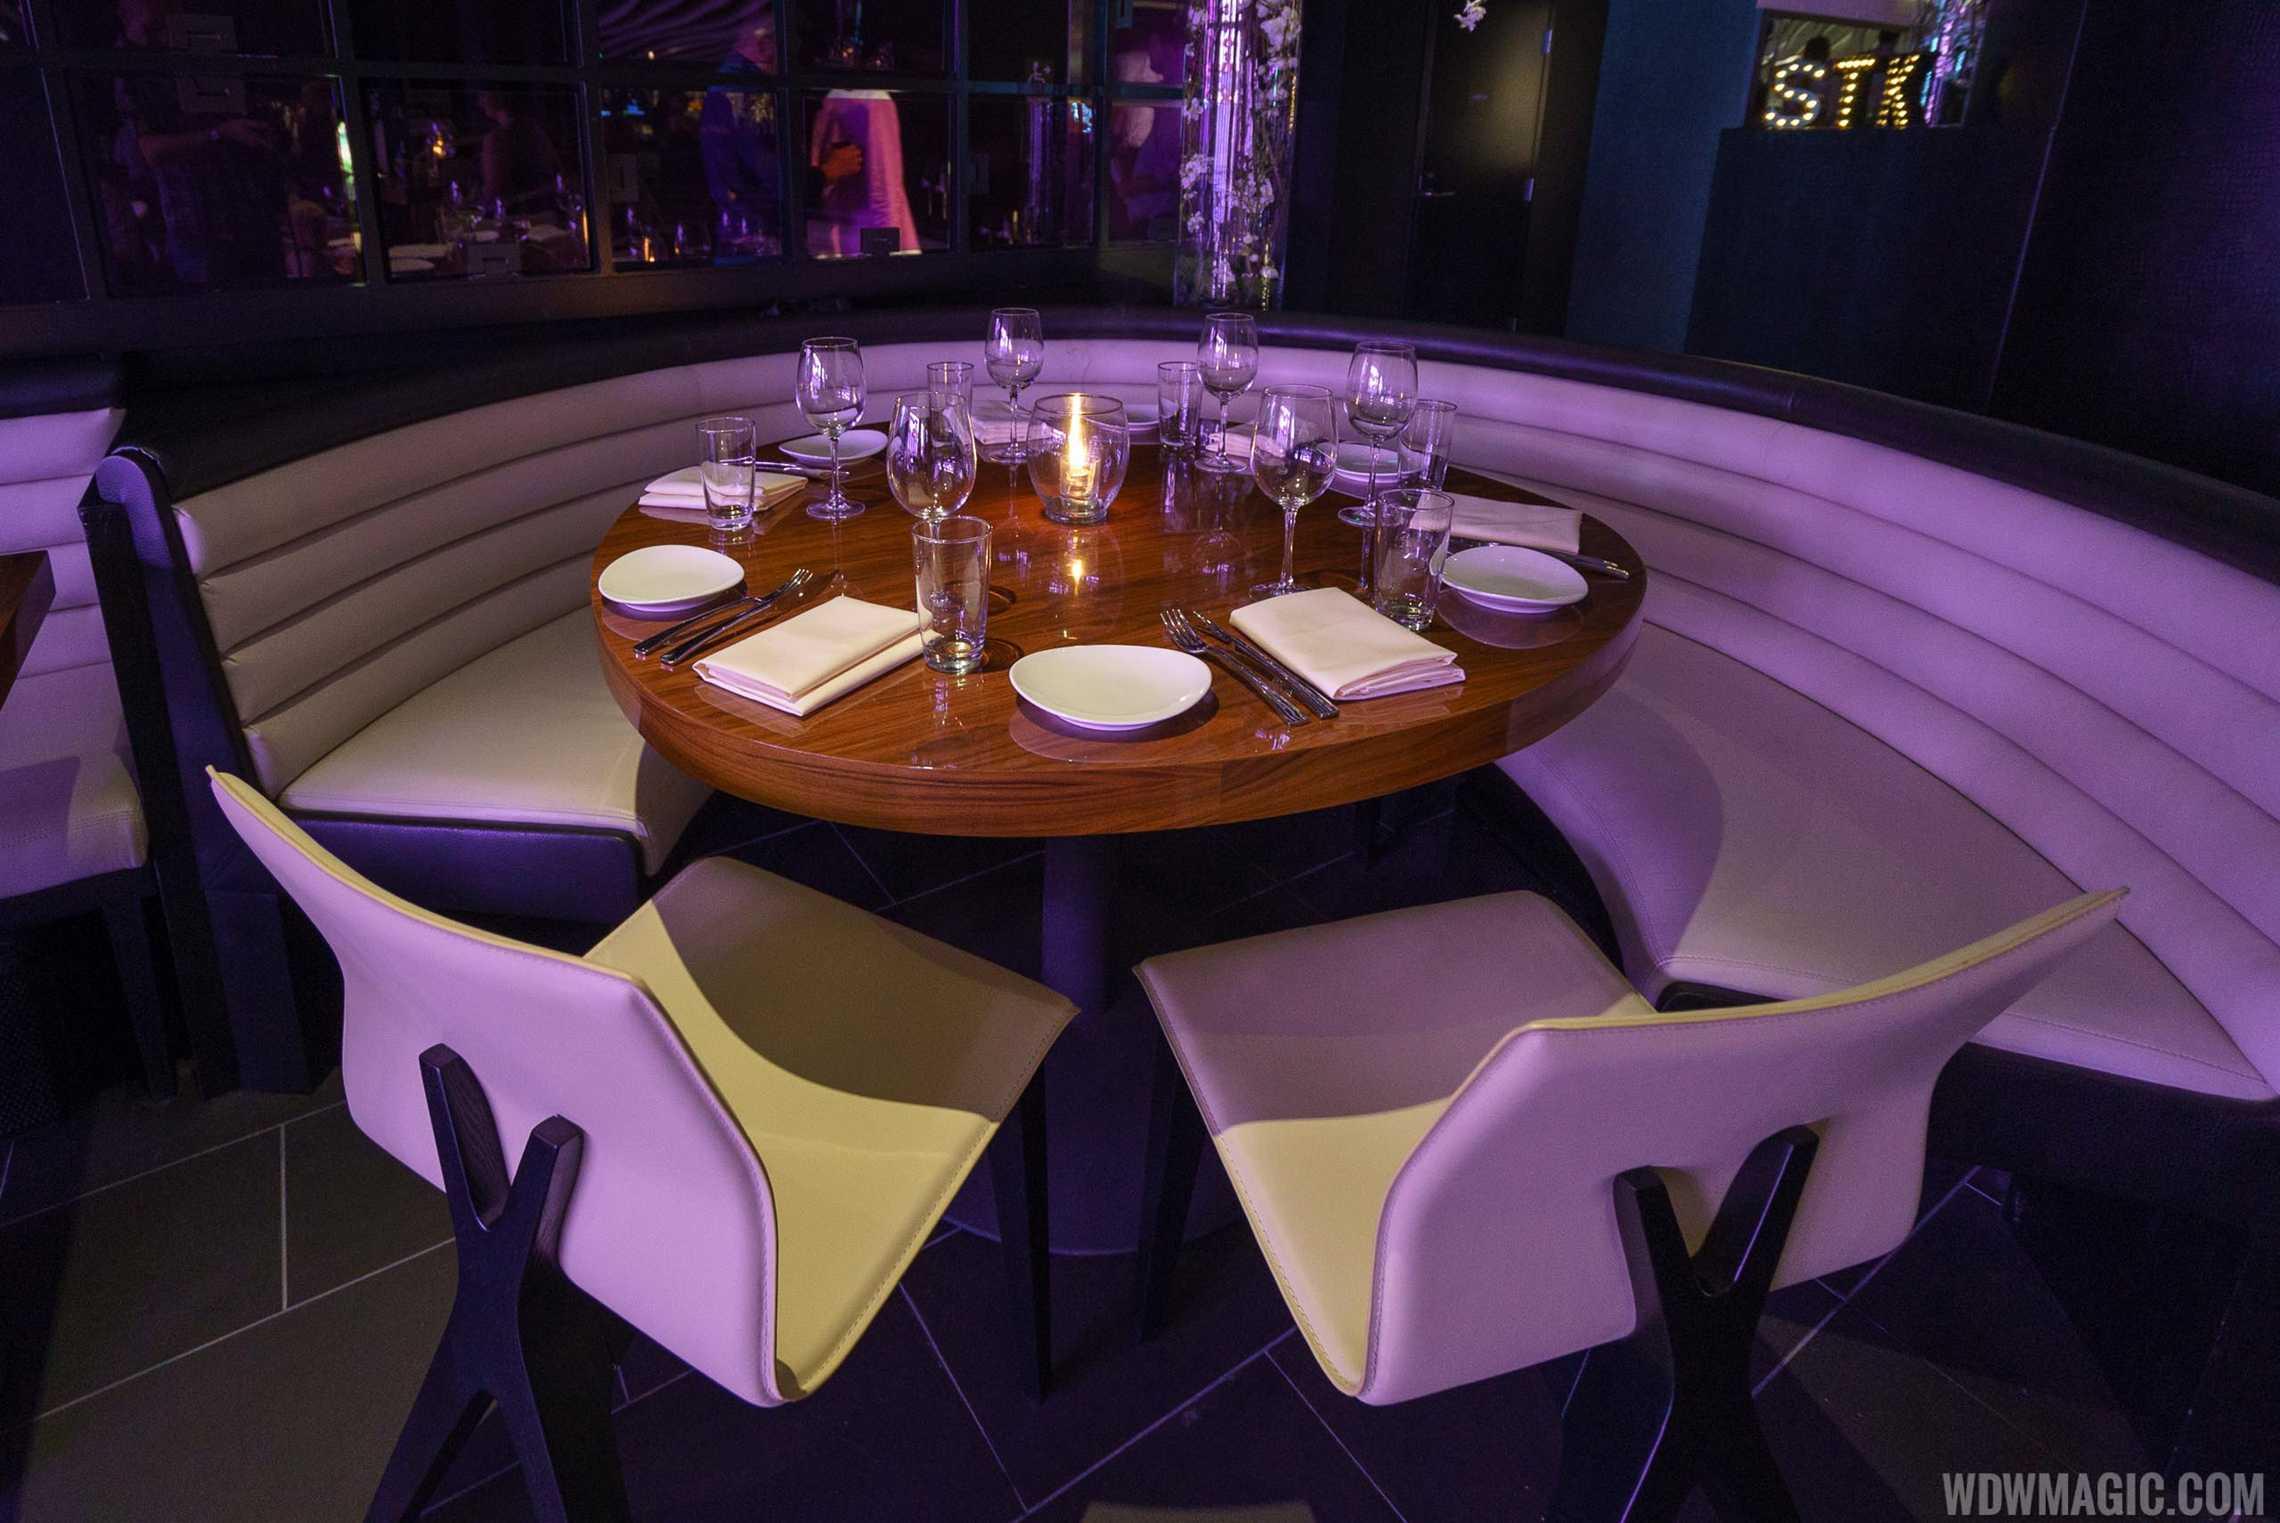 STK Orlando - Lower level table